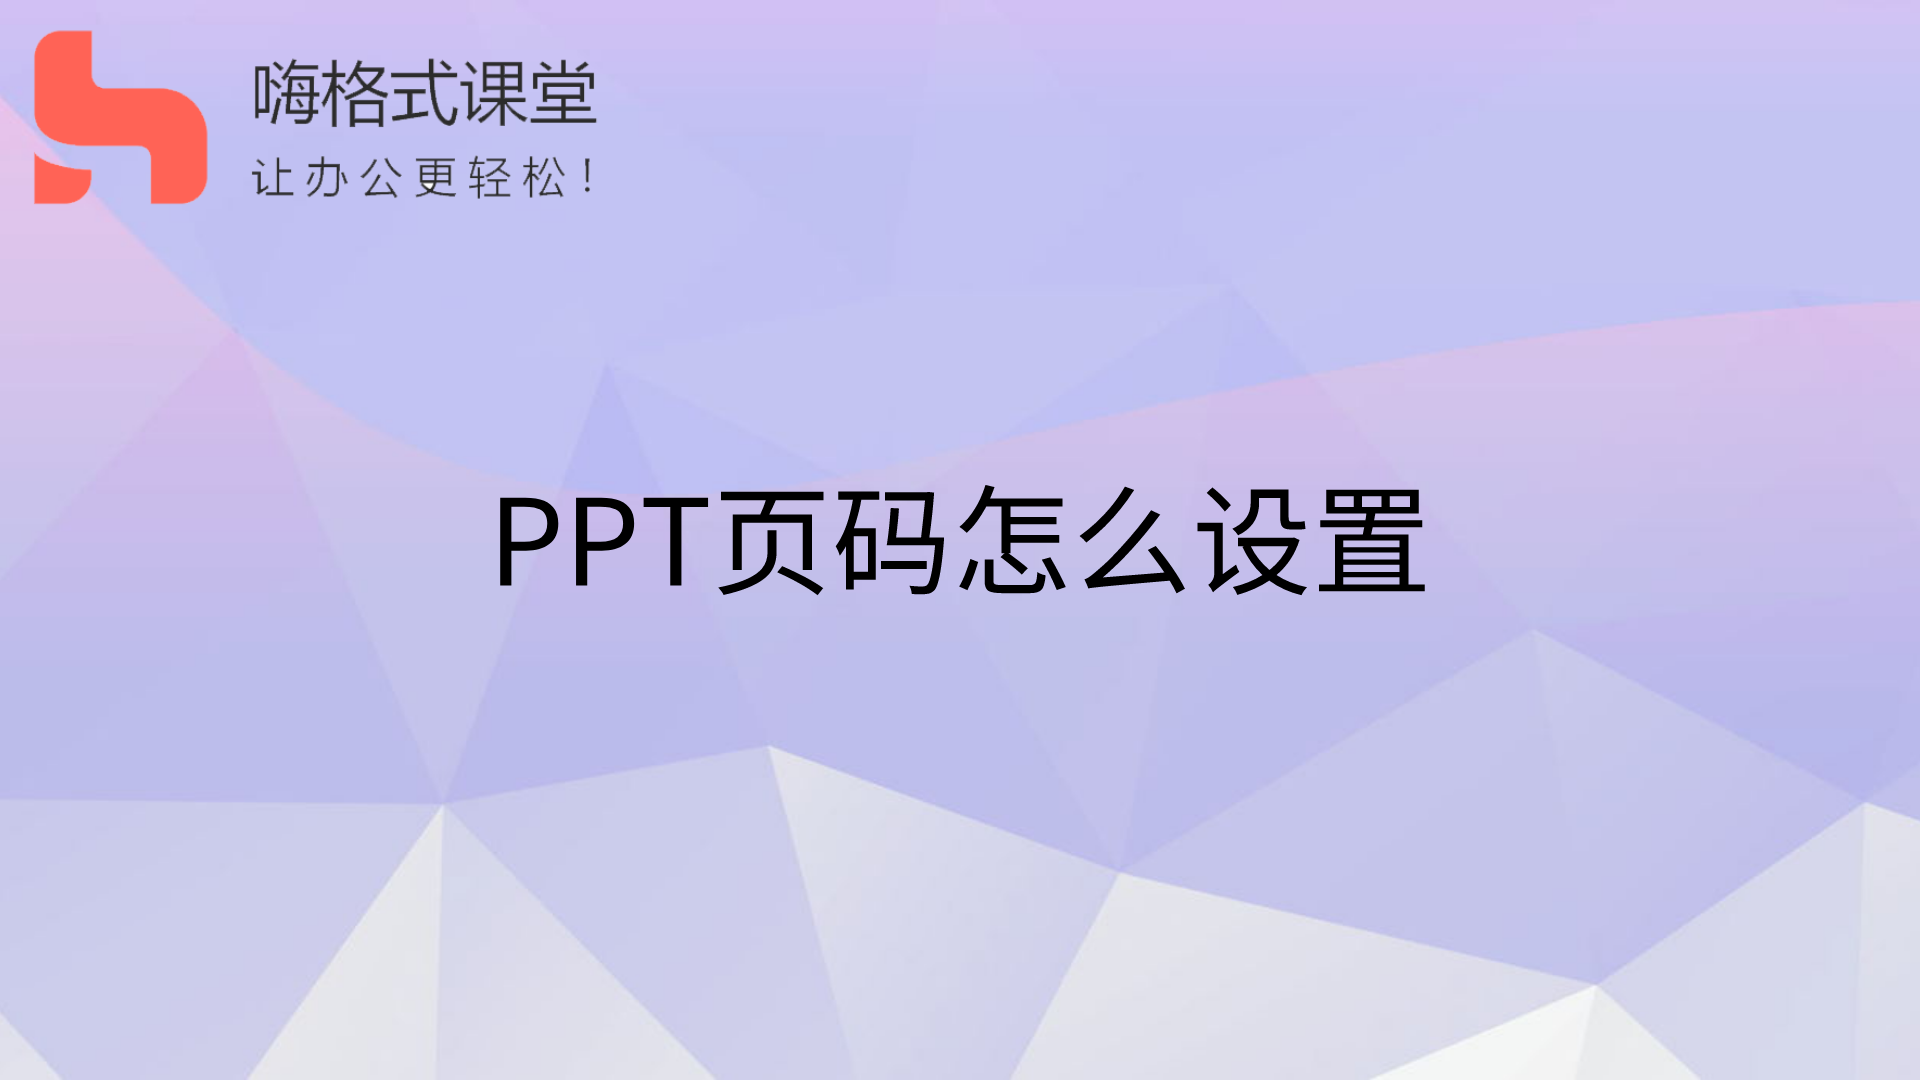 PPT页码怎么设置